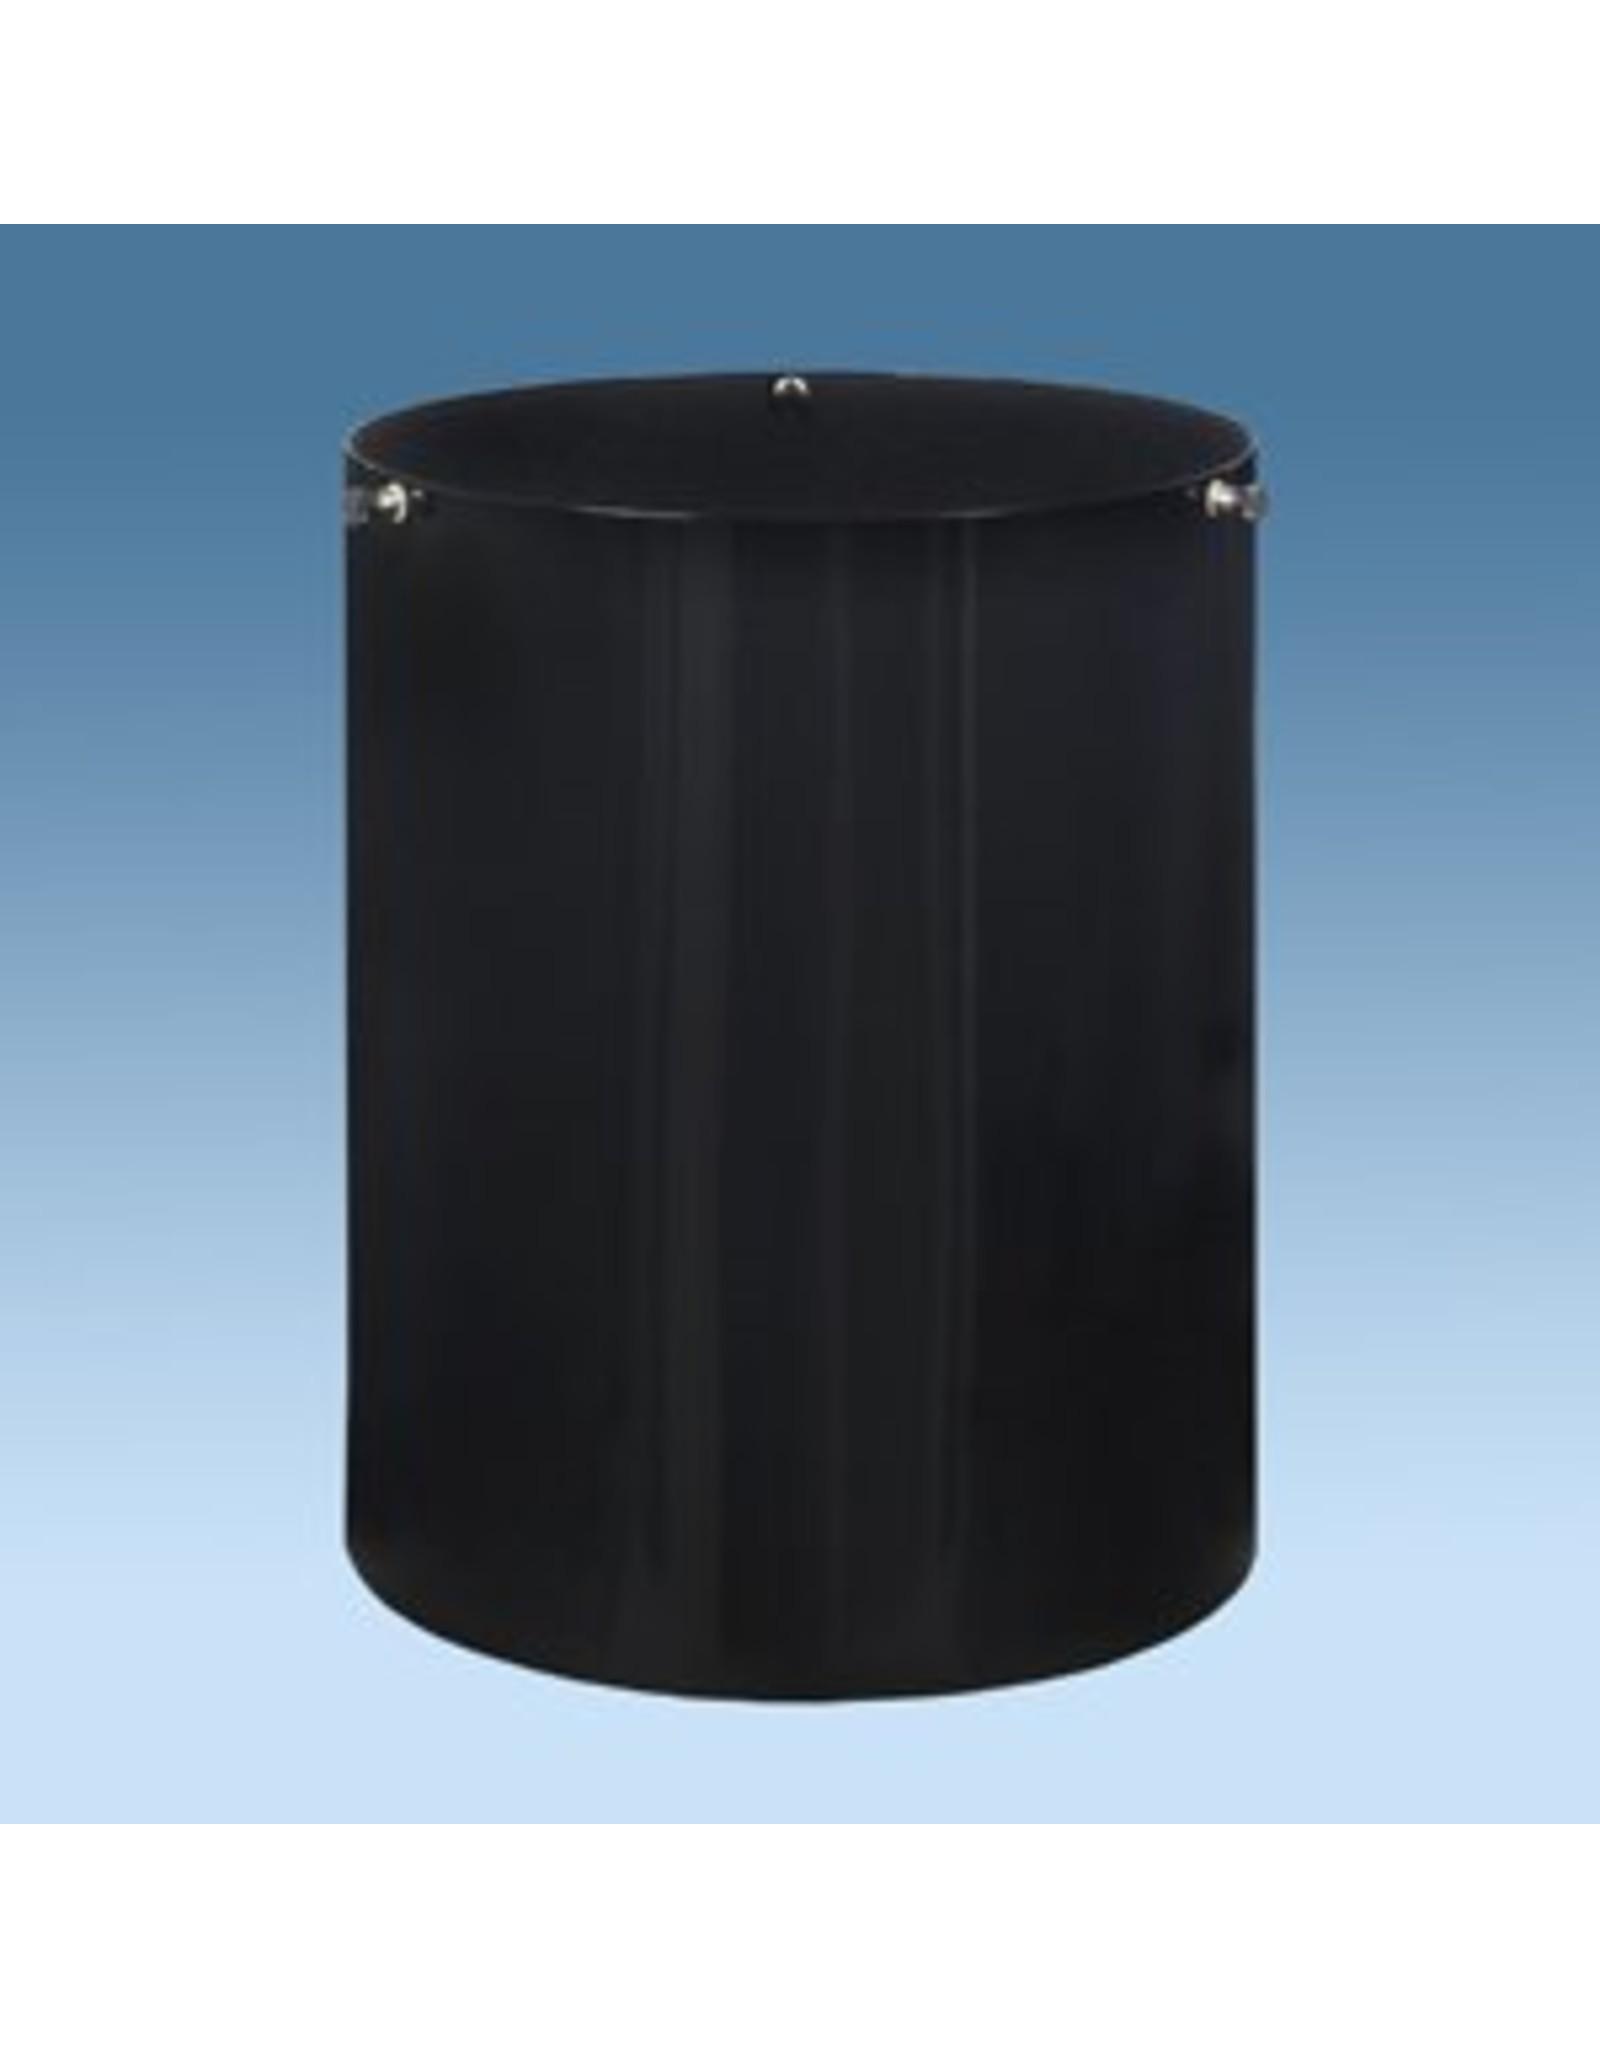 Astrozap AZ-217 Celestron 14 Sct - Black Dew Shield